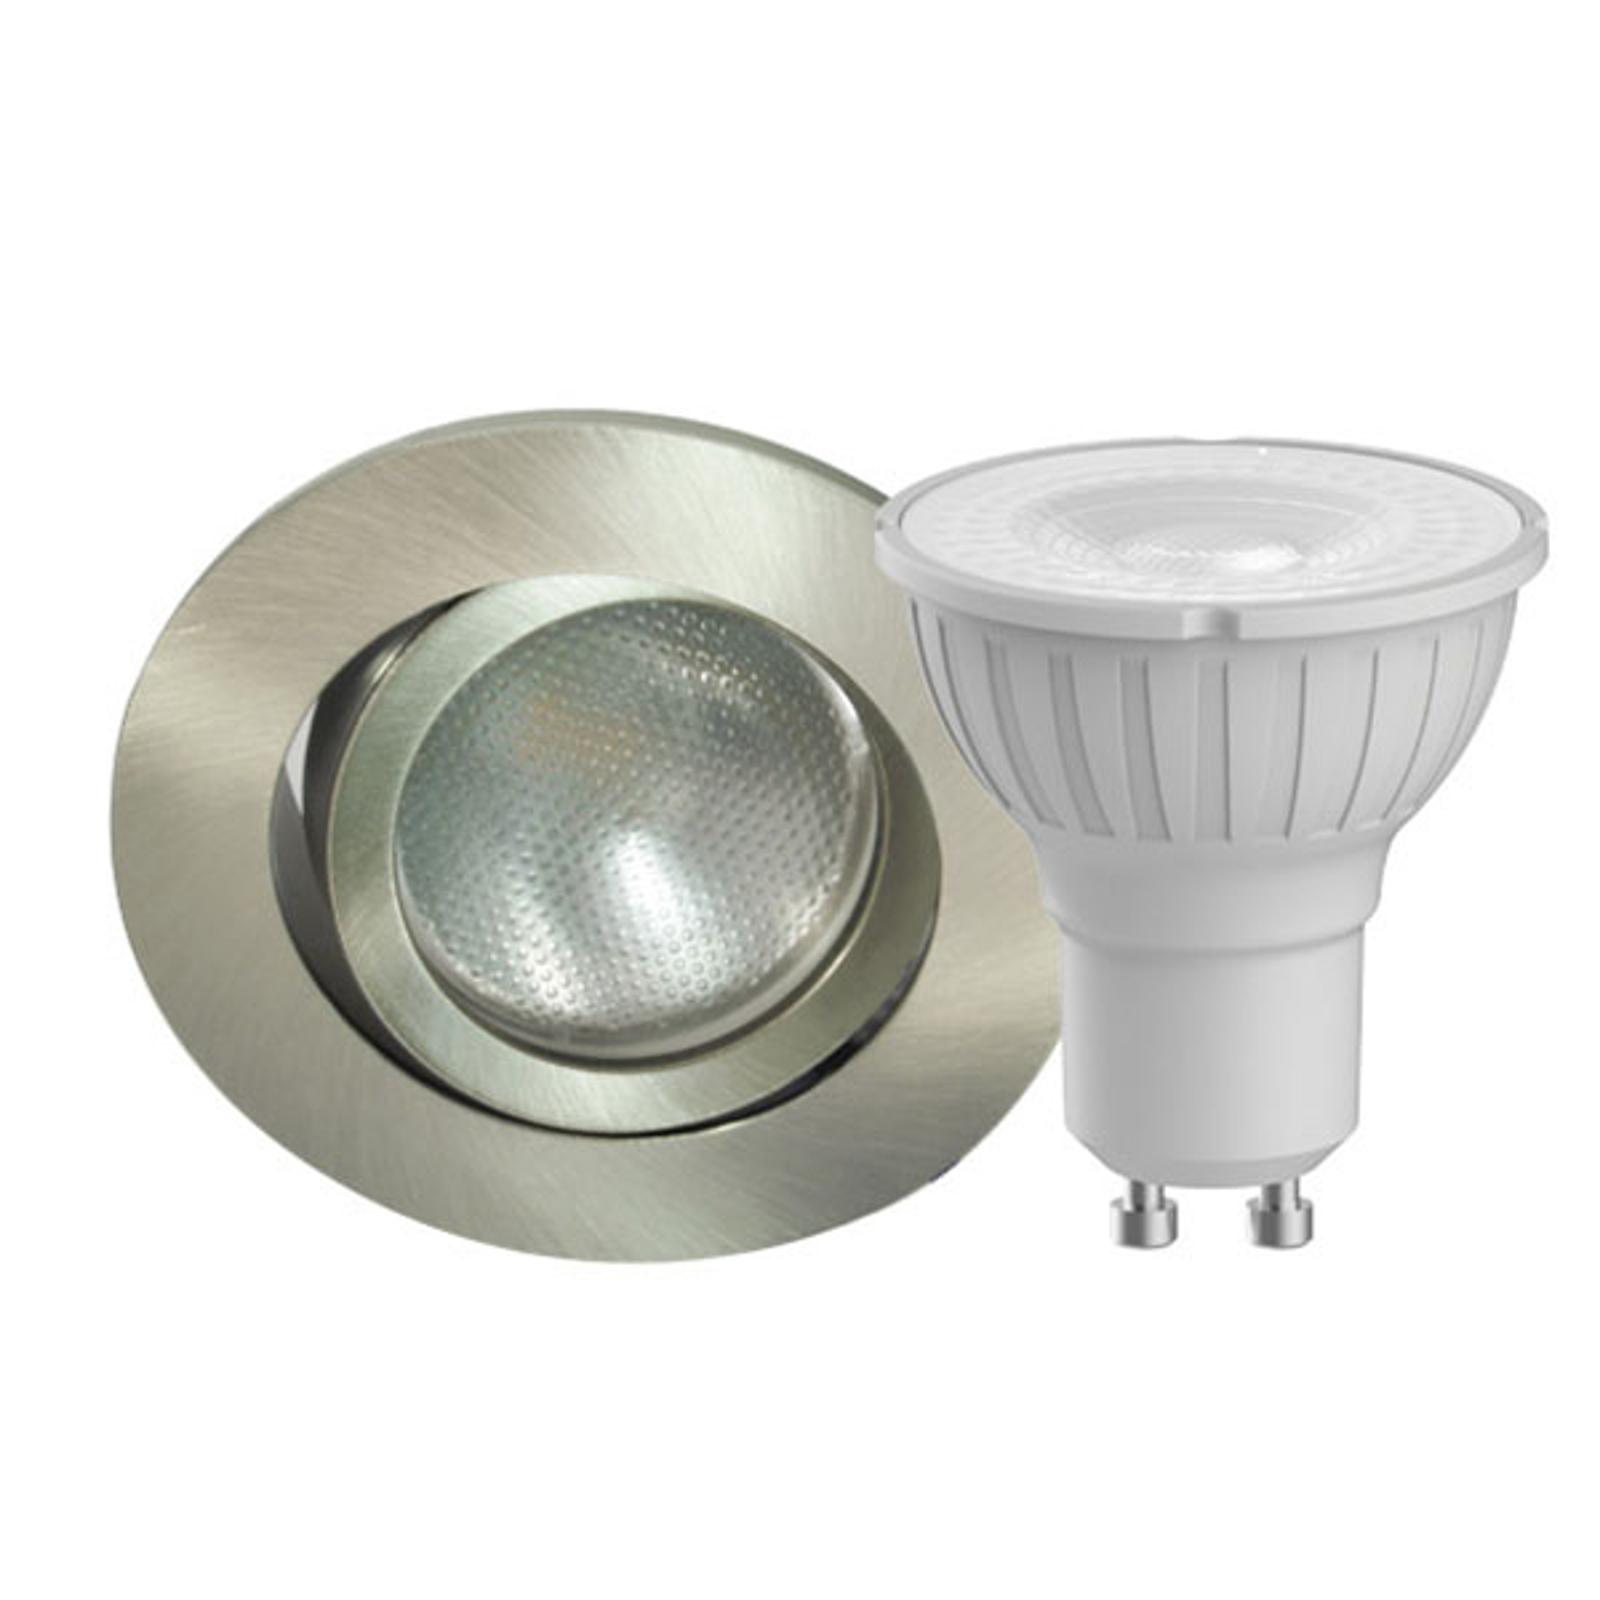 Megaman DecoclicSet LED-Einbauring GU10 4,2W eisen